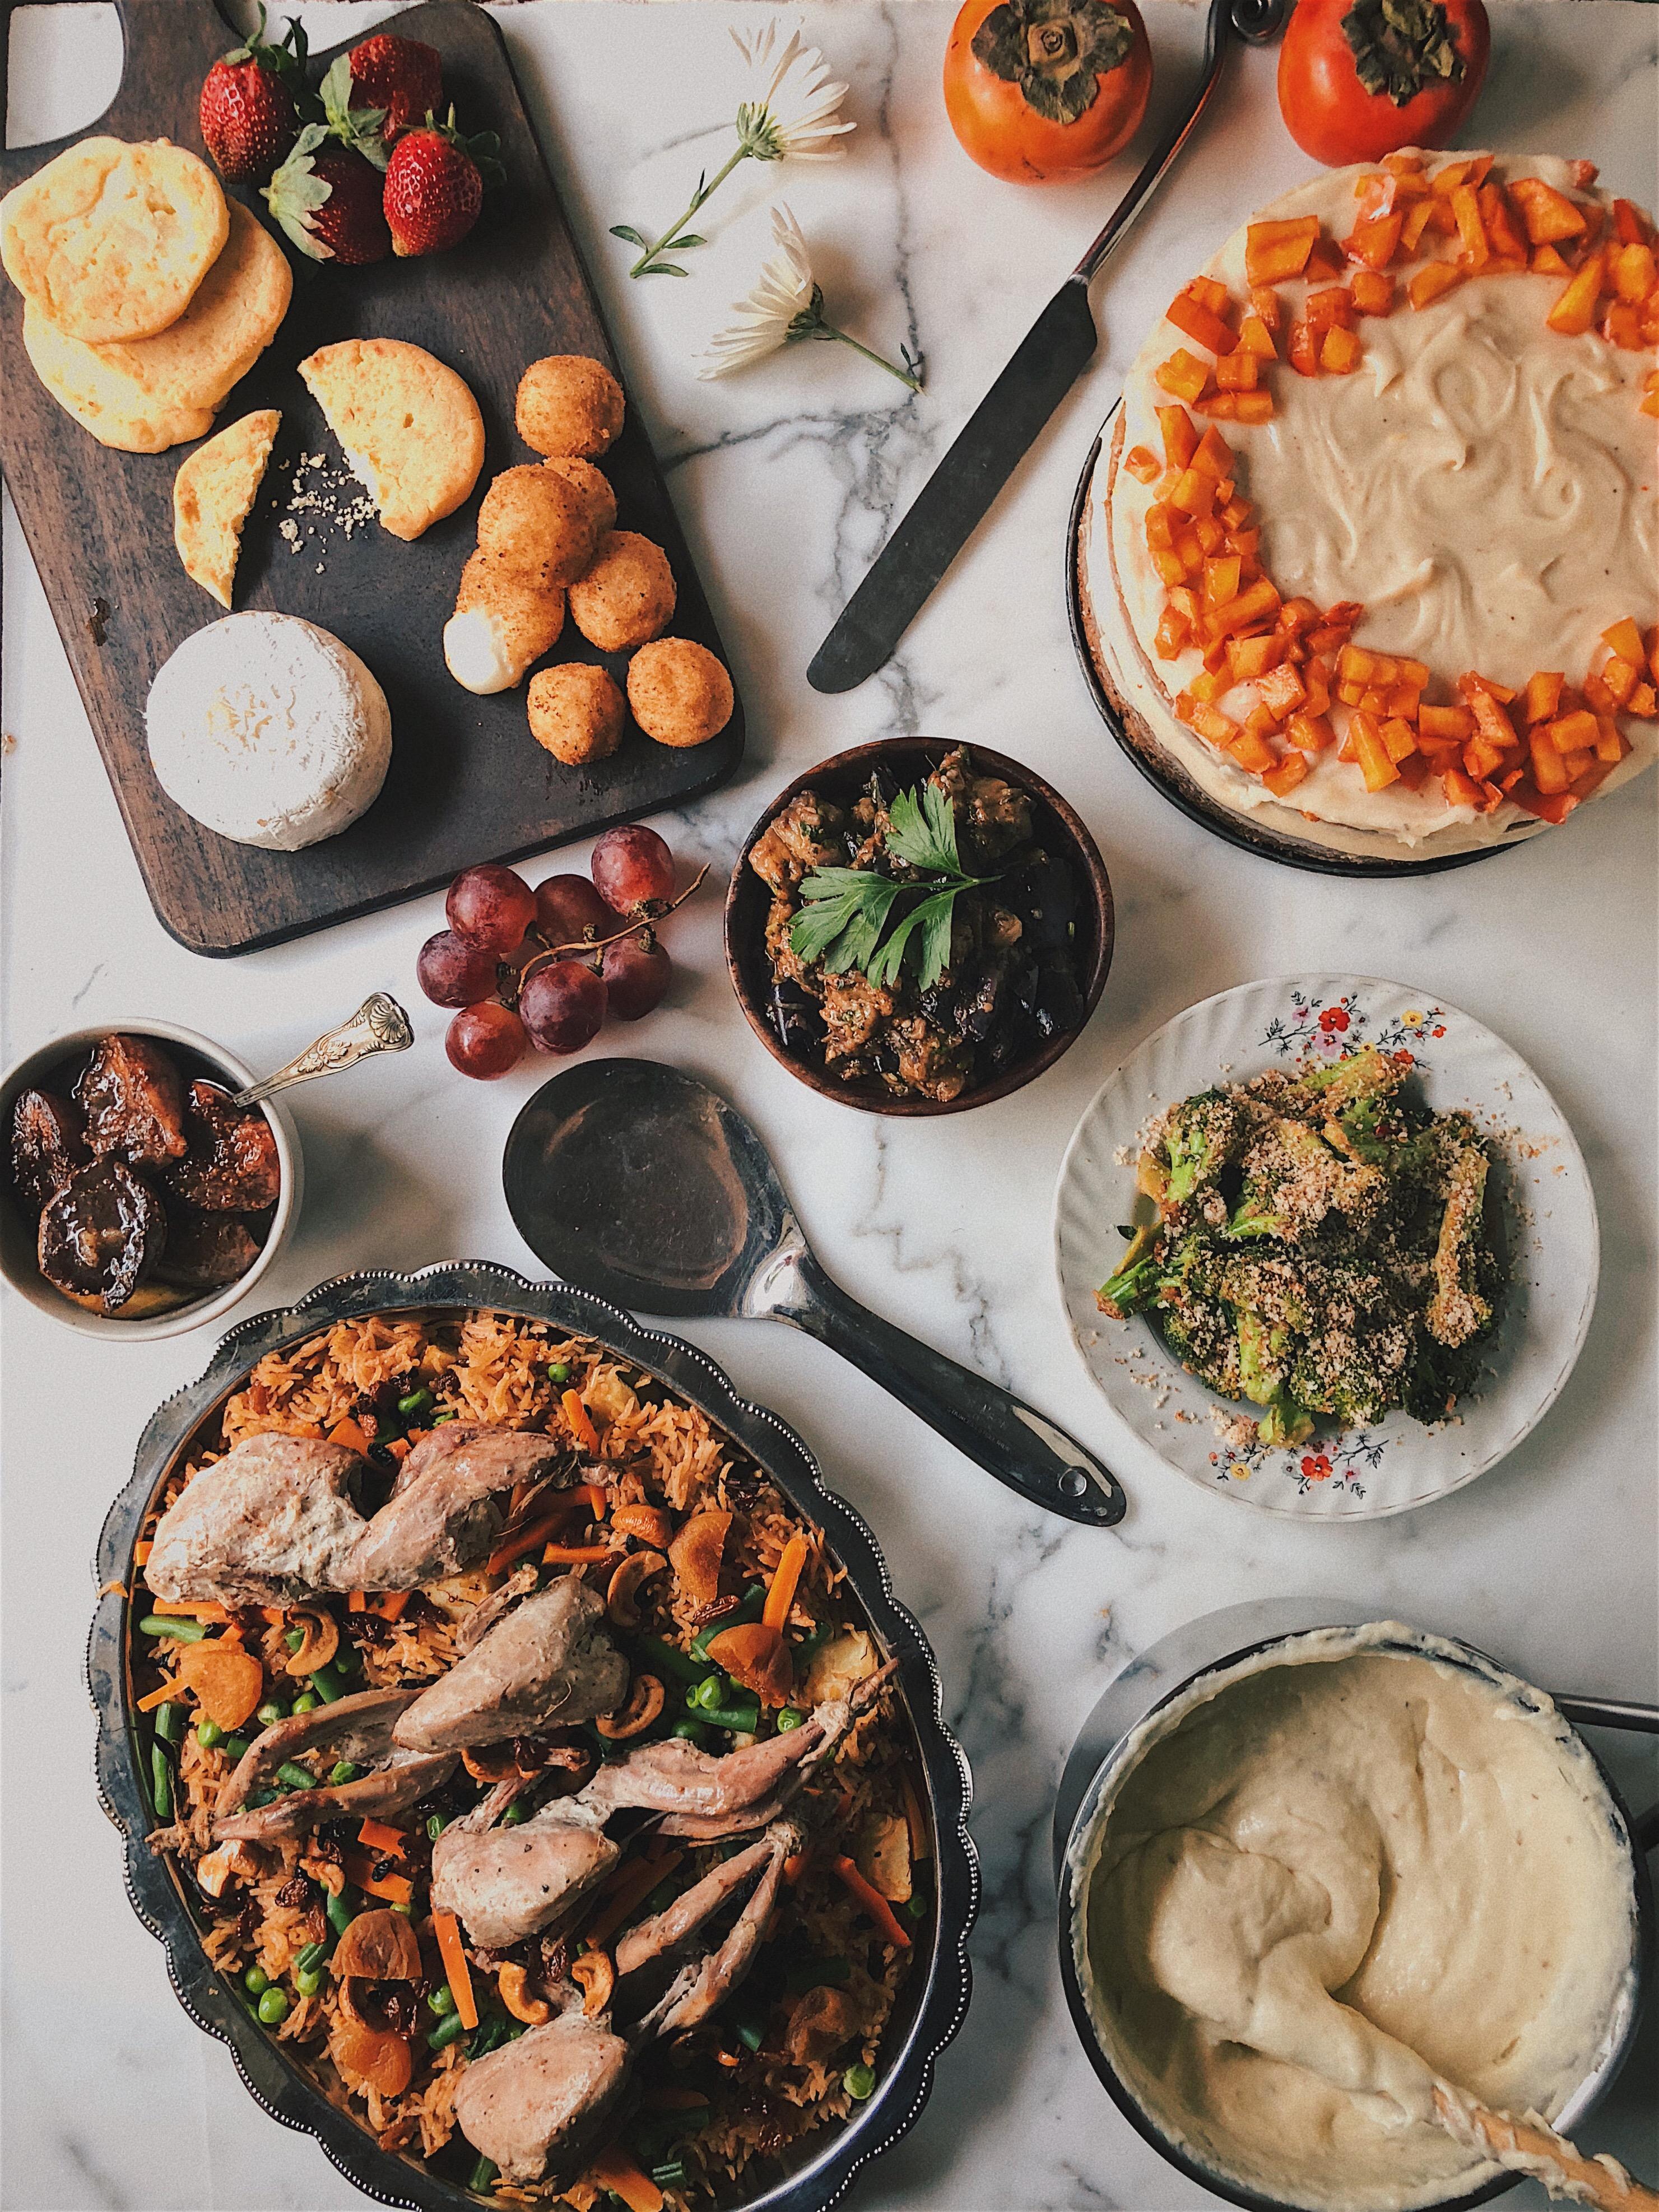 Feast Of Plenty